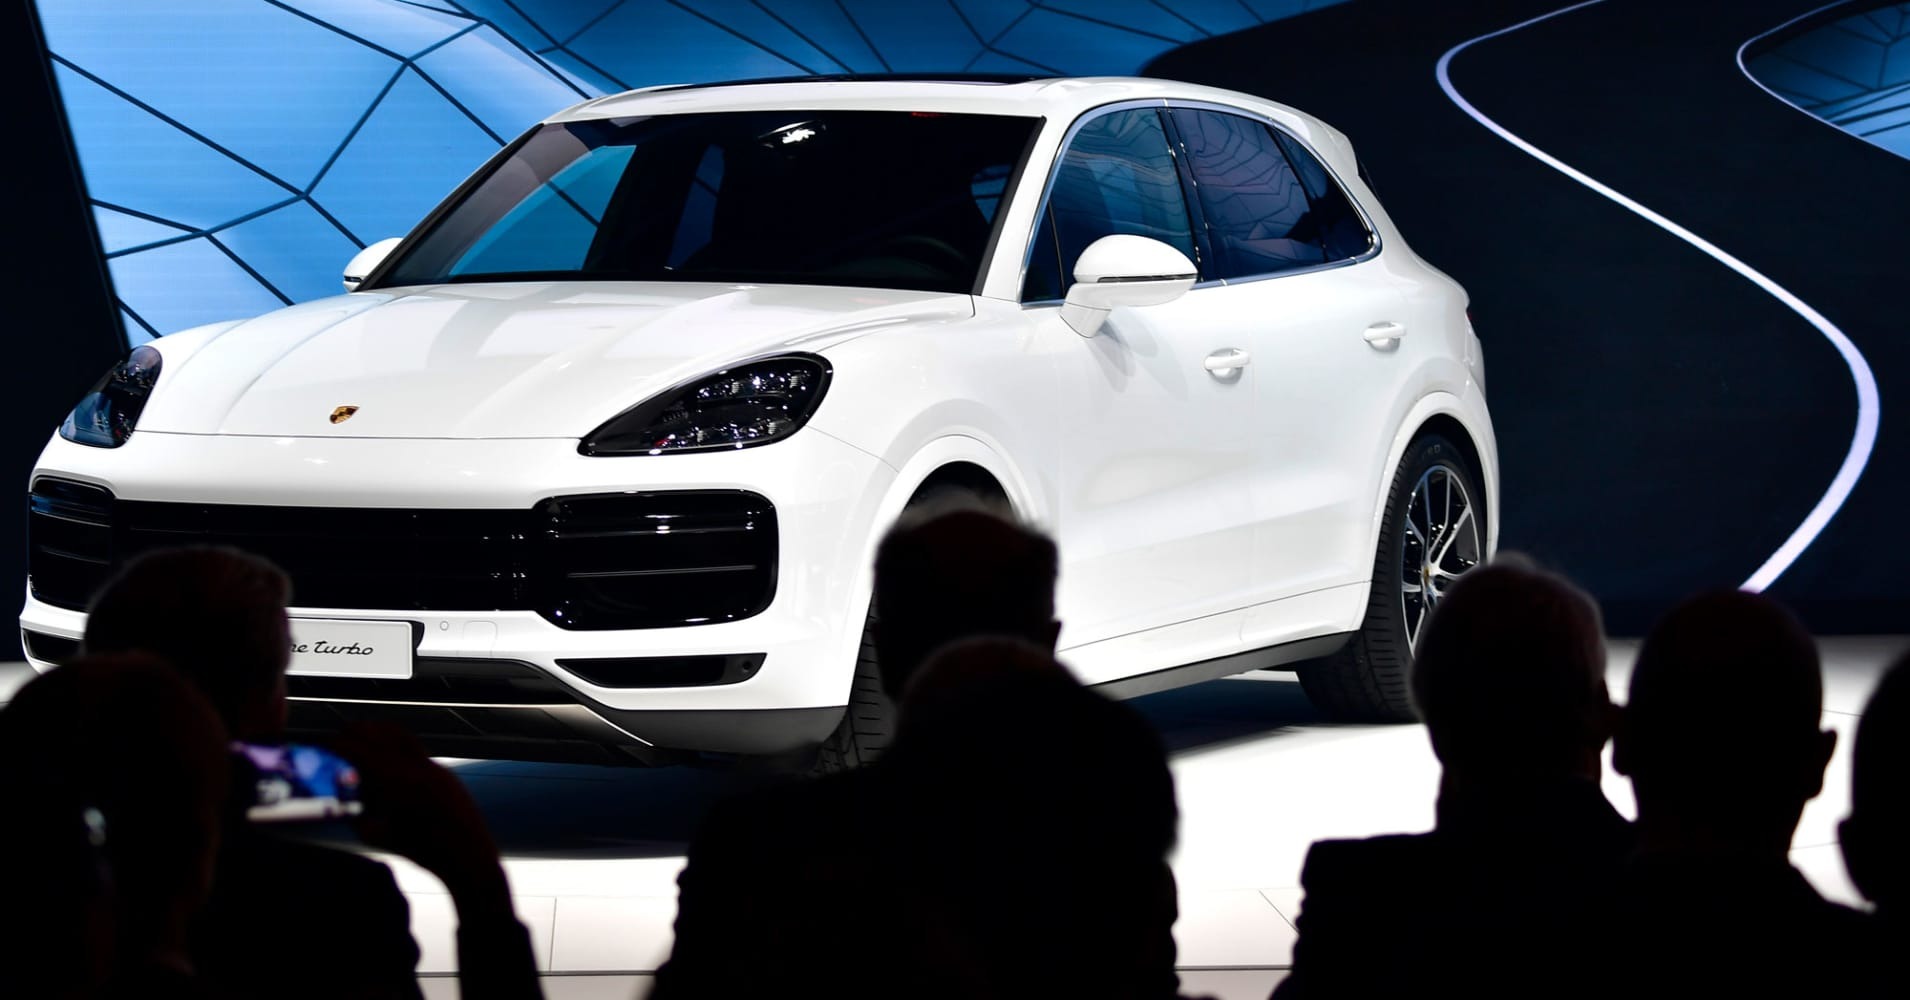 Auto company Porsche launches a car subscription service